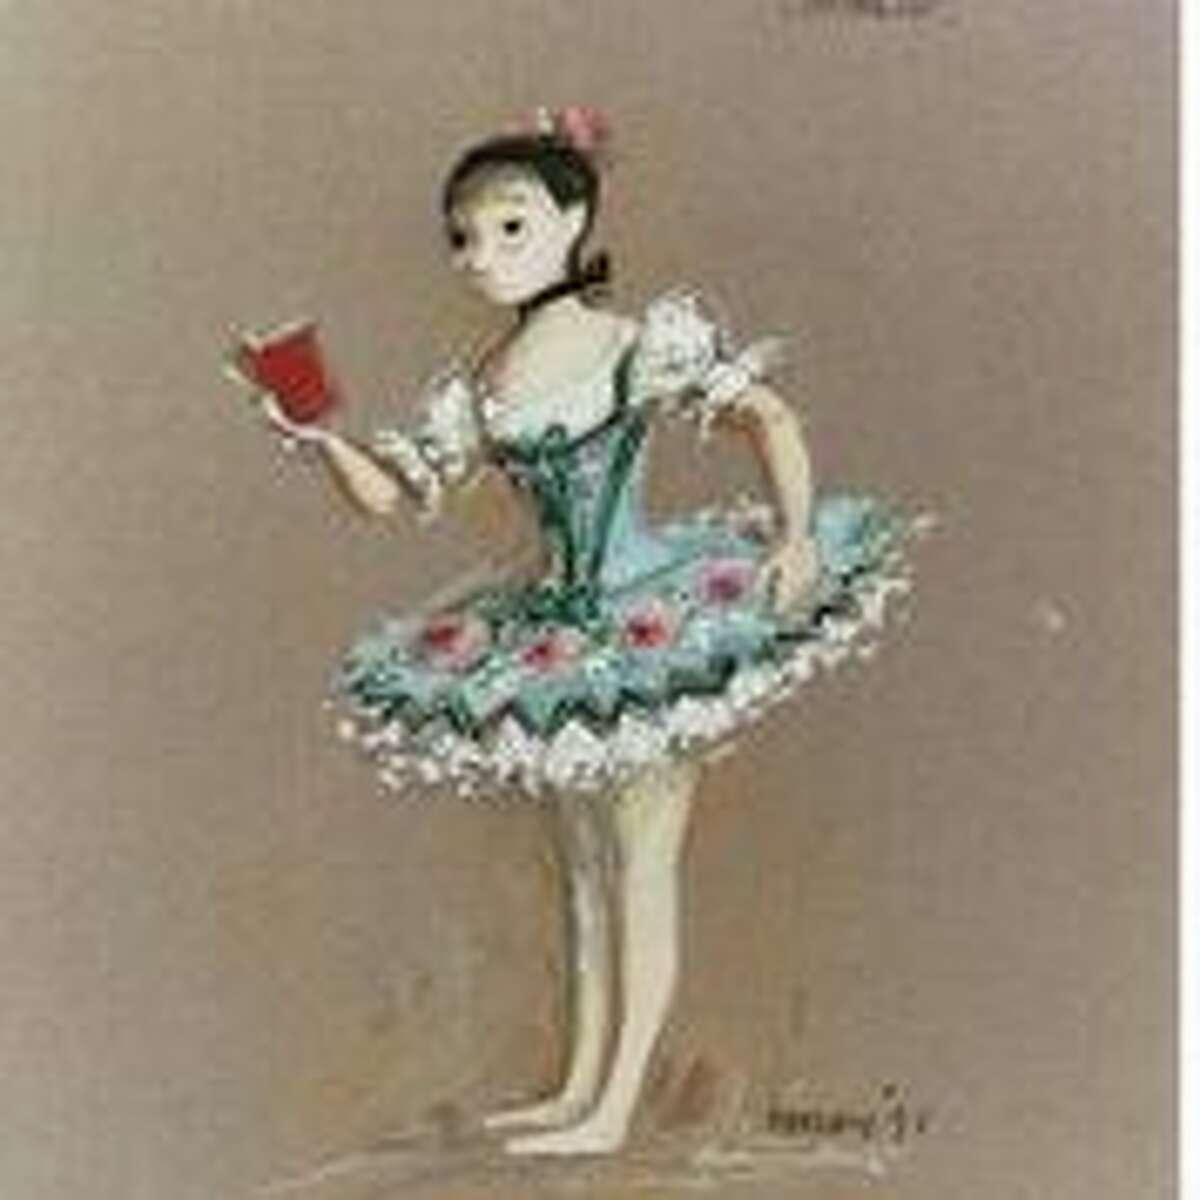 A 1992 Desmond Heeley costume sketch for Houston Ballet's Coppelia.